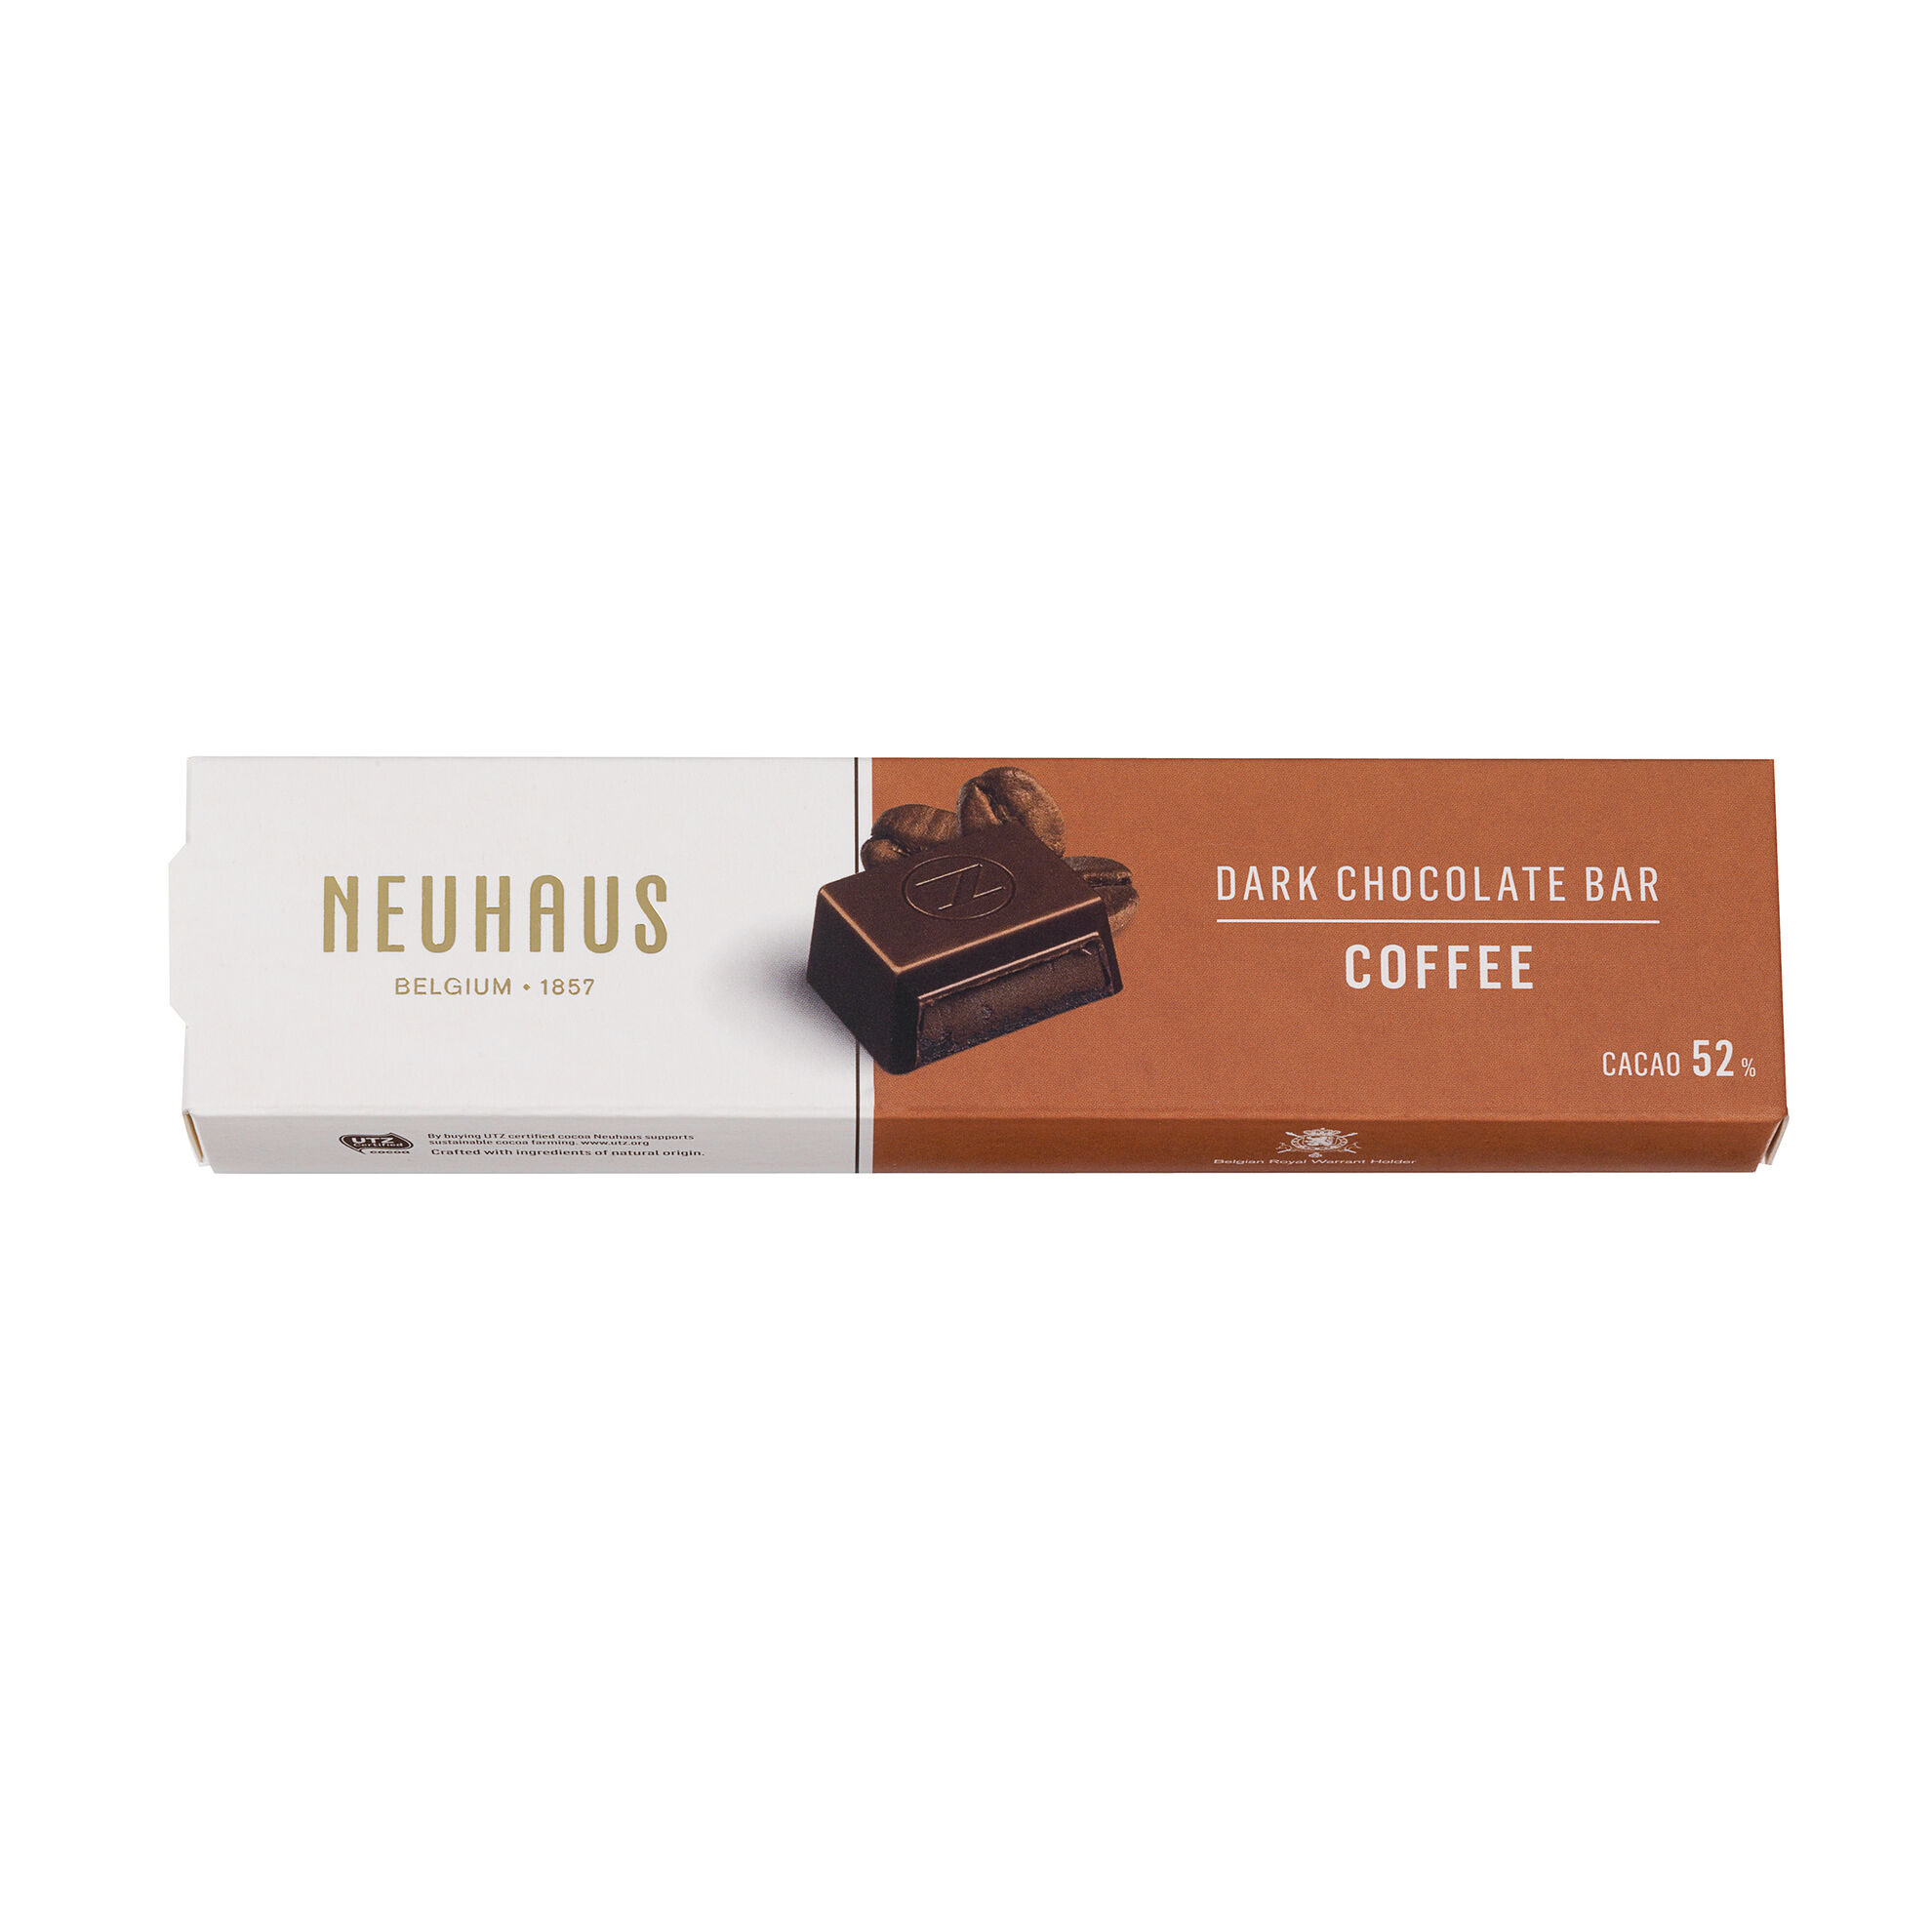 Dark Chocolate Bar - Coffee image number 11